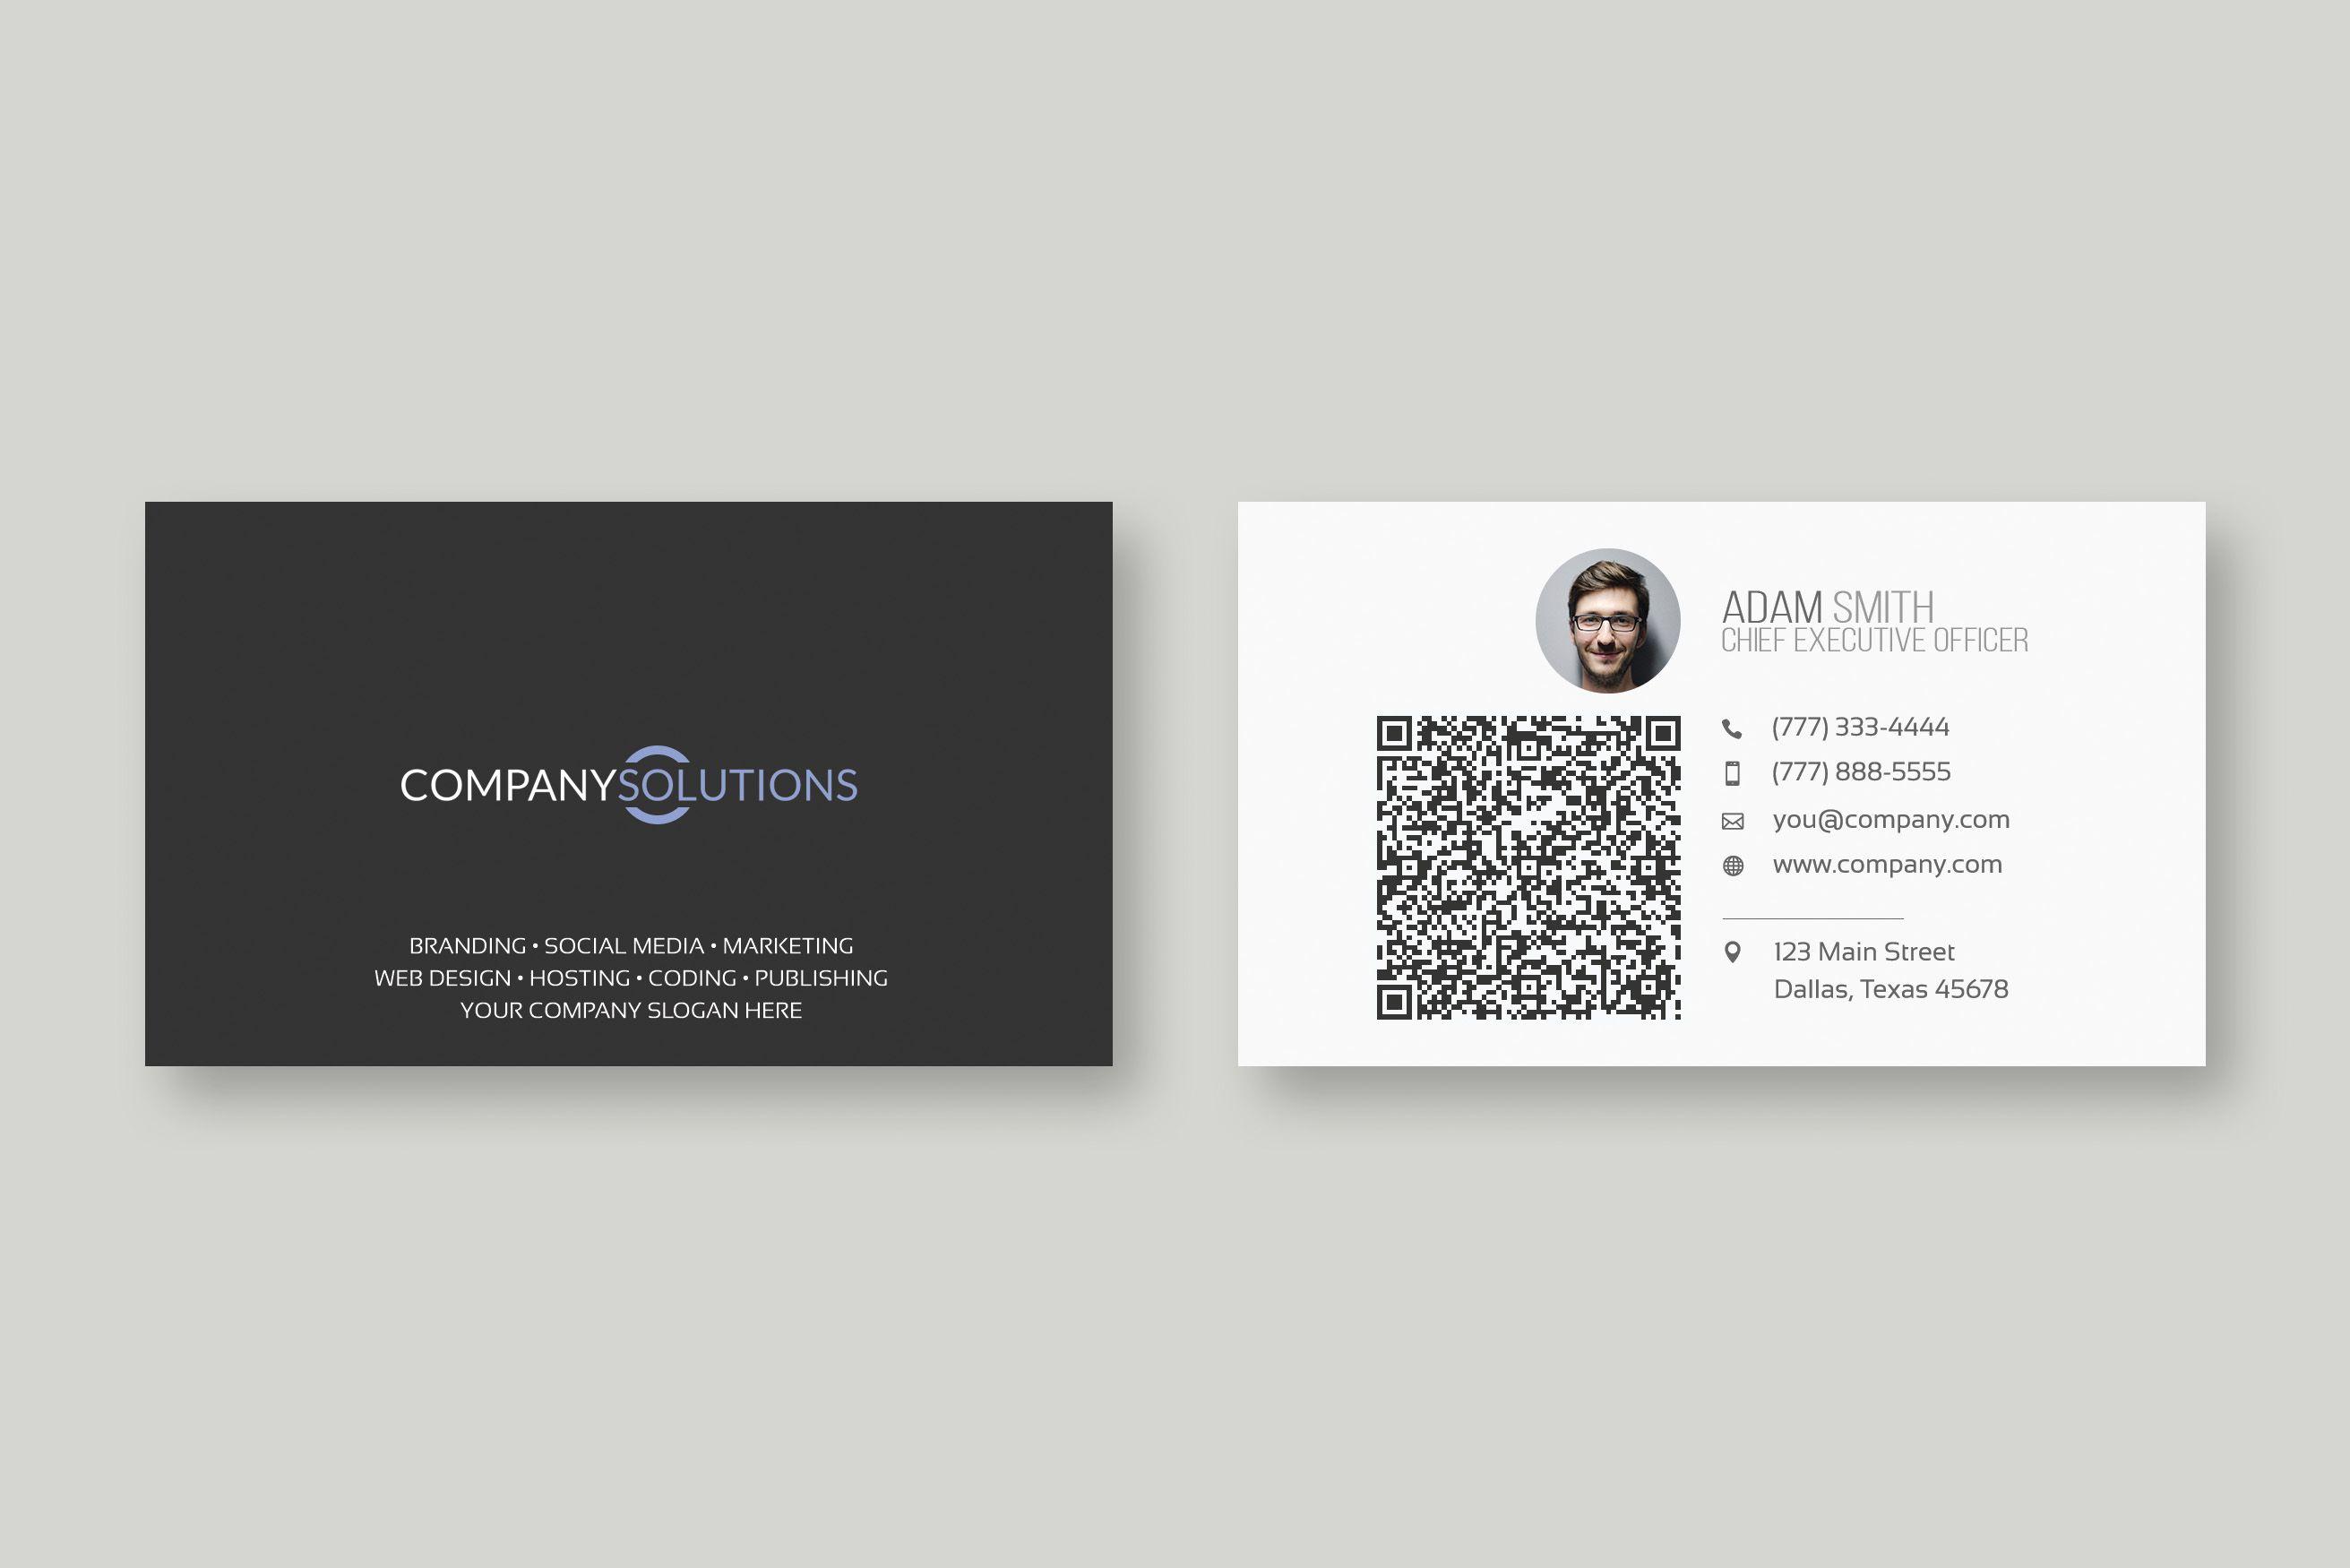 Modern Qr Code Business Card Template Intended For Qr Code Business Card Template Cumed Org In 2020 Qr Code Business Card Business Card Template Business Card Fonts